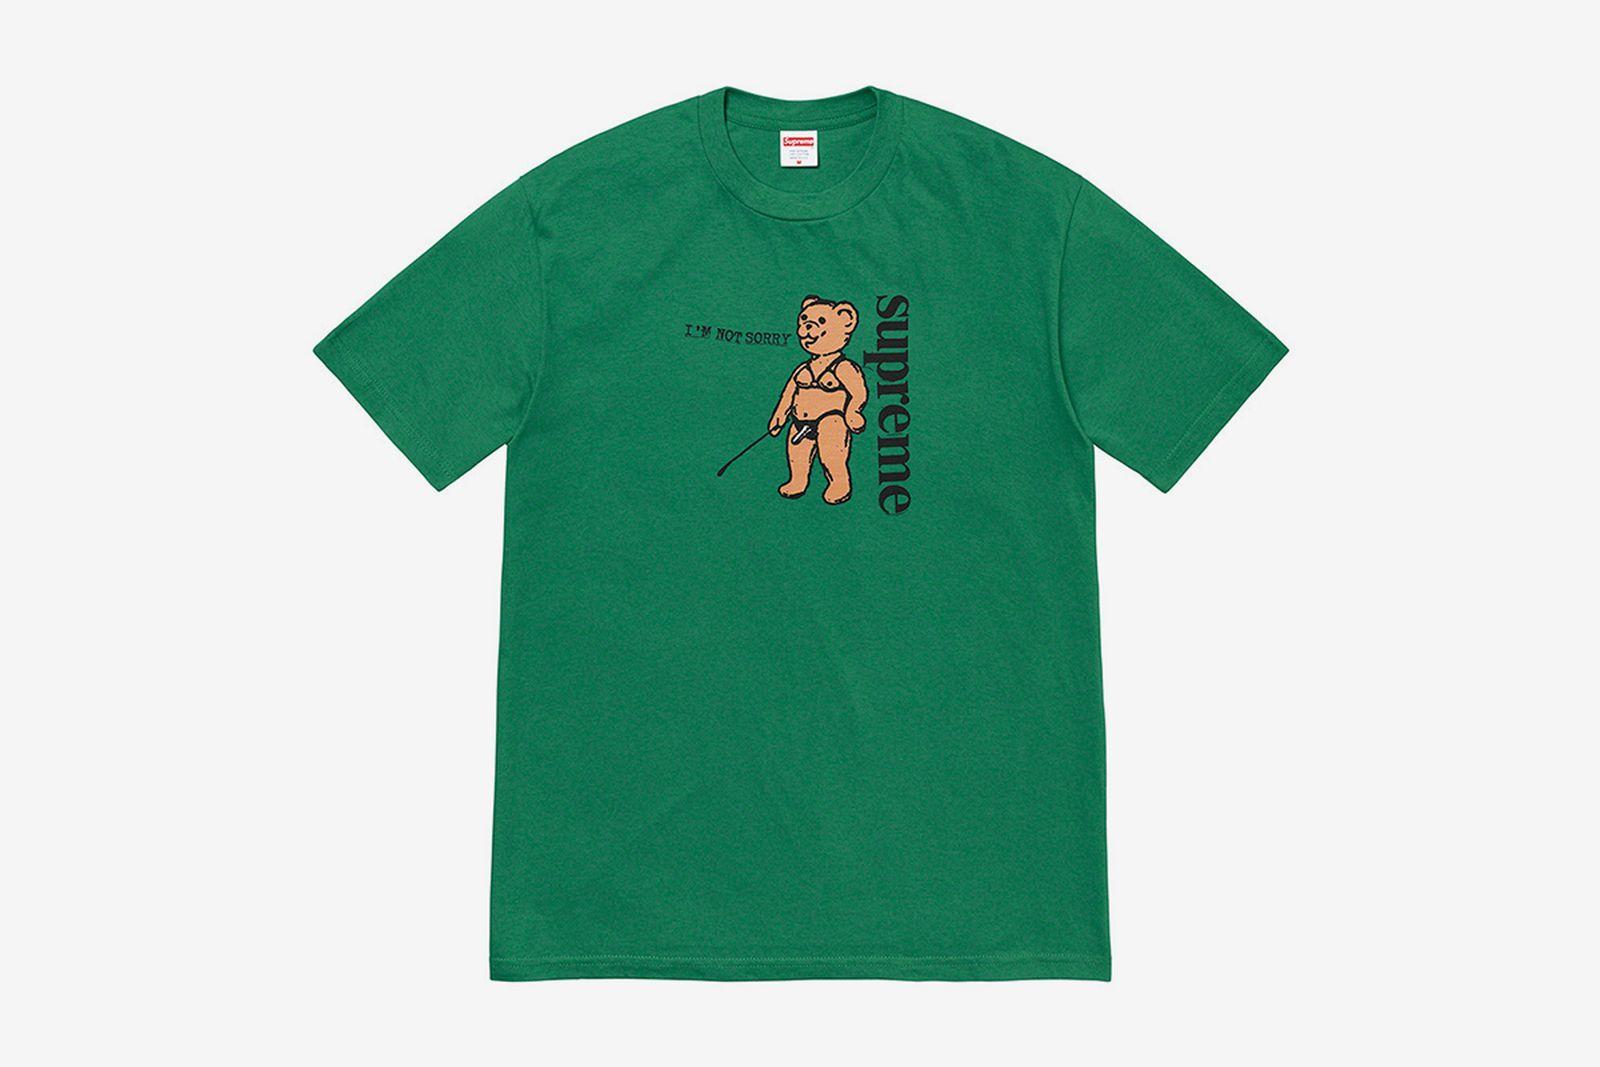 supreme-spring-2021-t-shirts-12